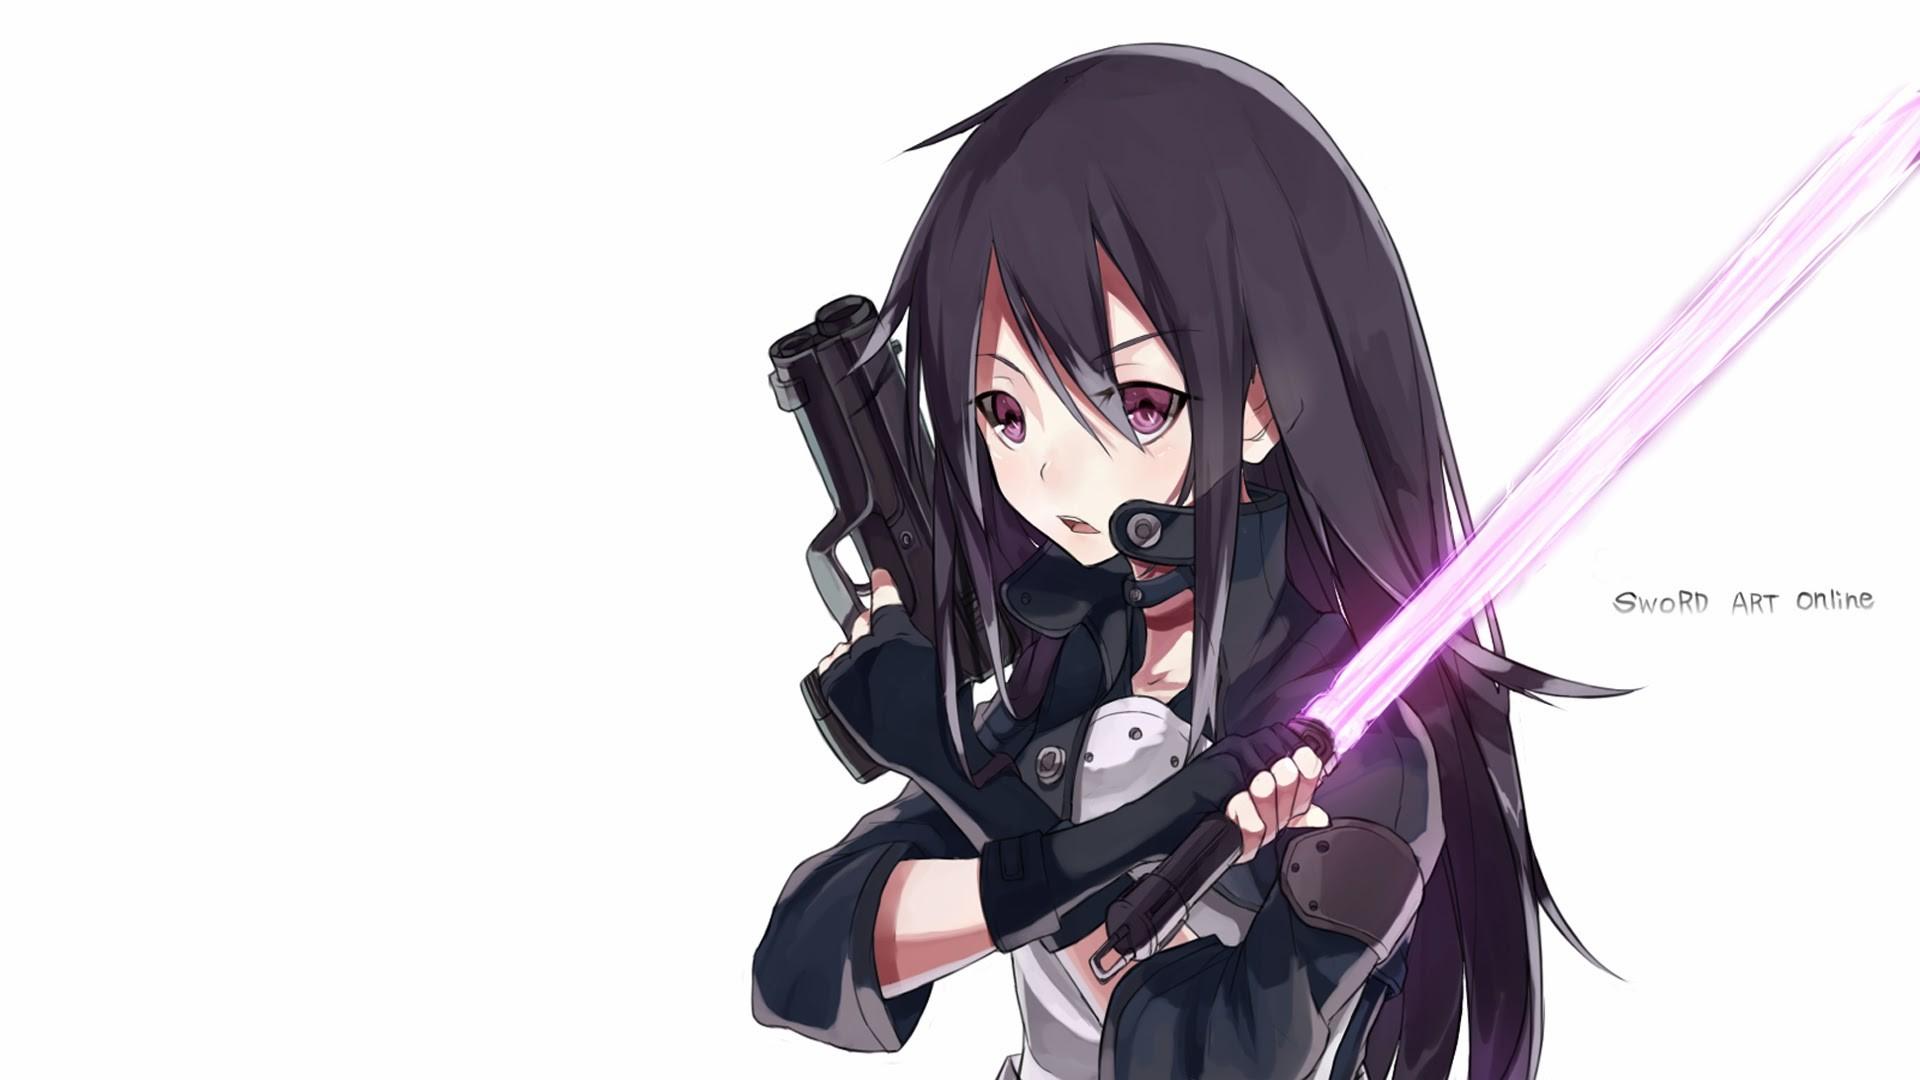 kirito gun gale online sword art online 2 phantom bullet arc anime hd .